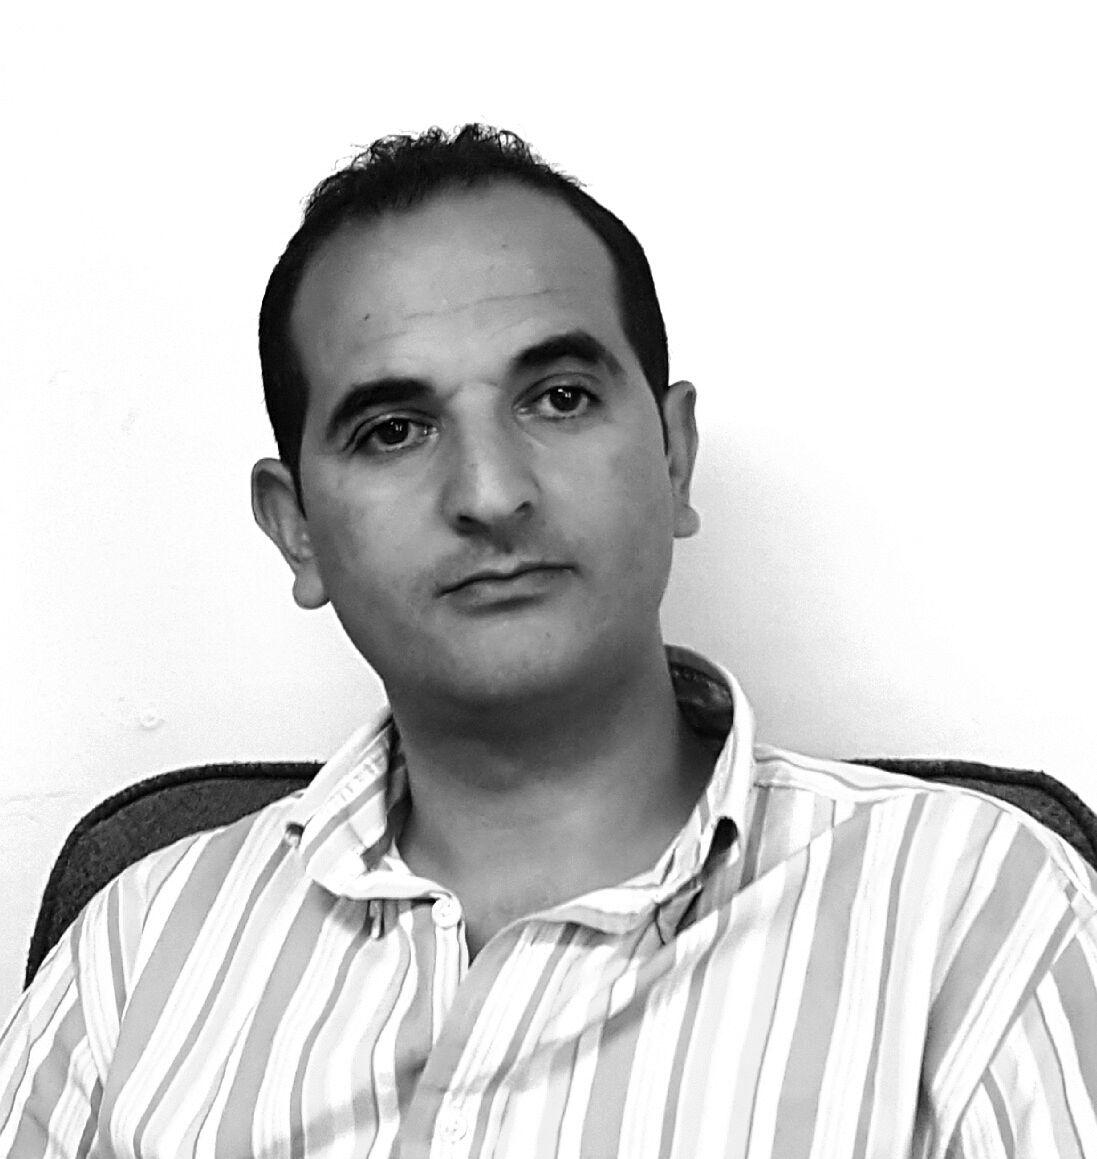 توفيق محمد سلمون Headshot